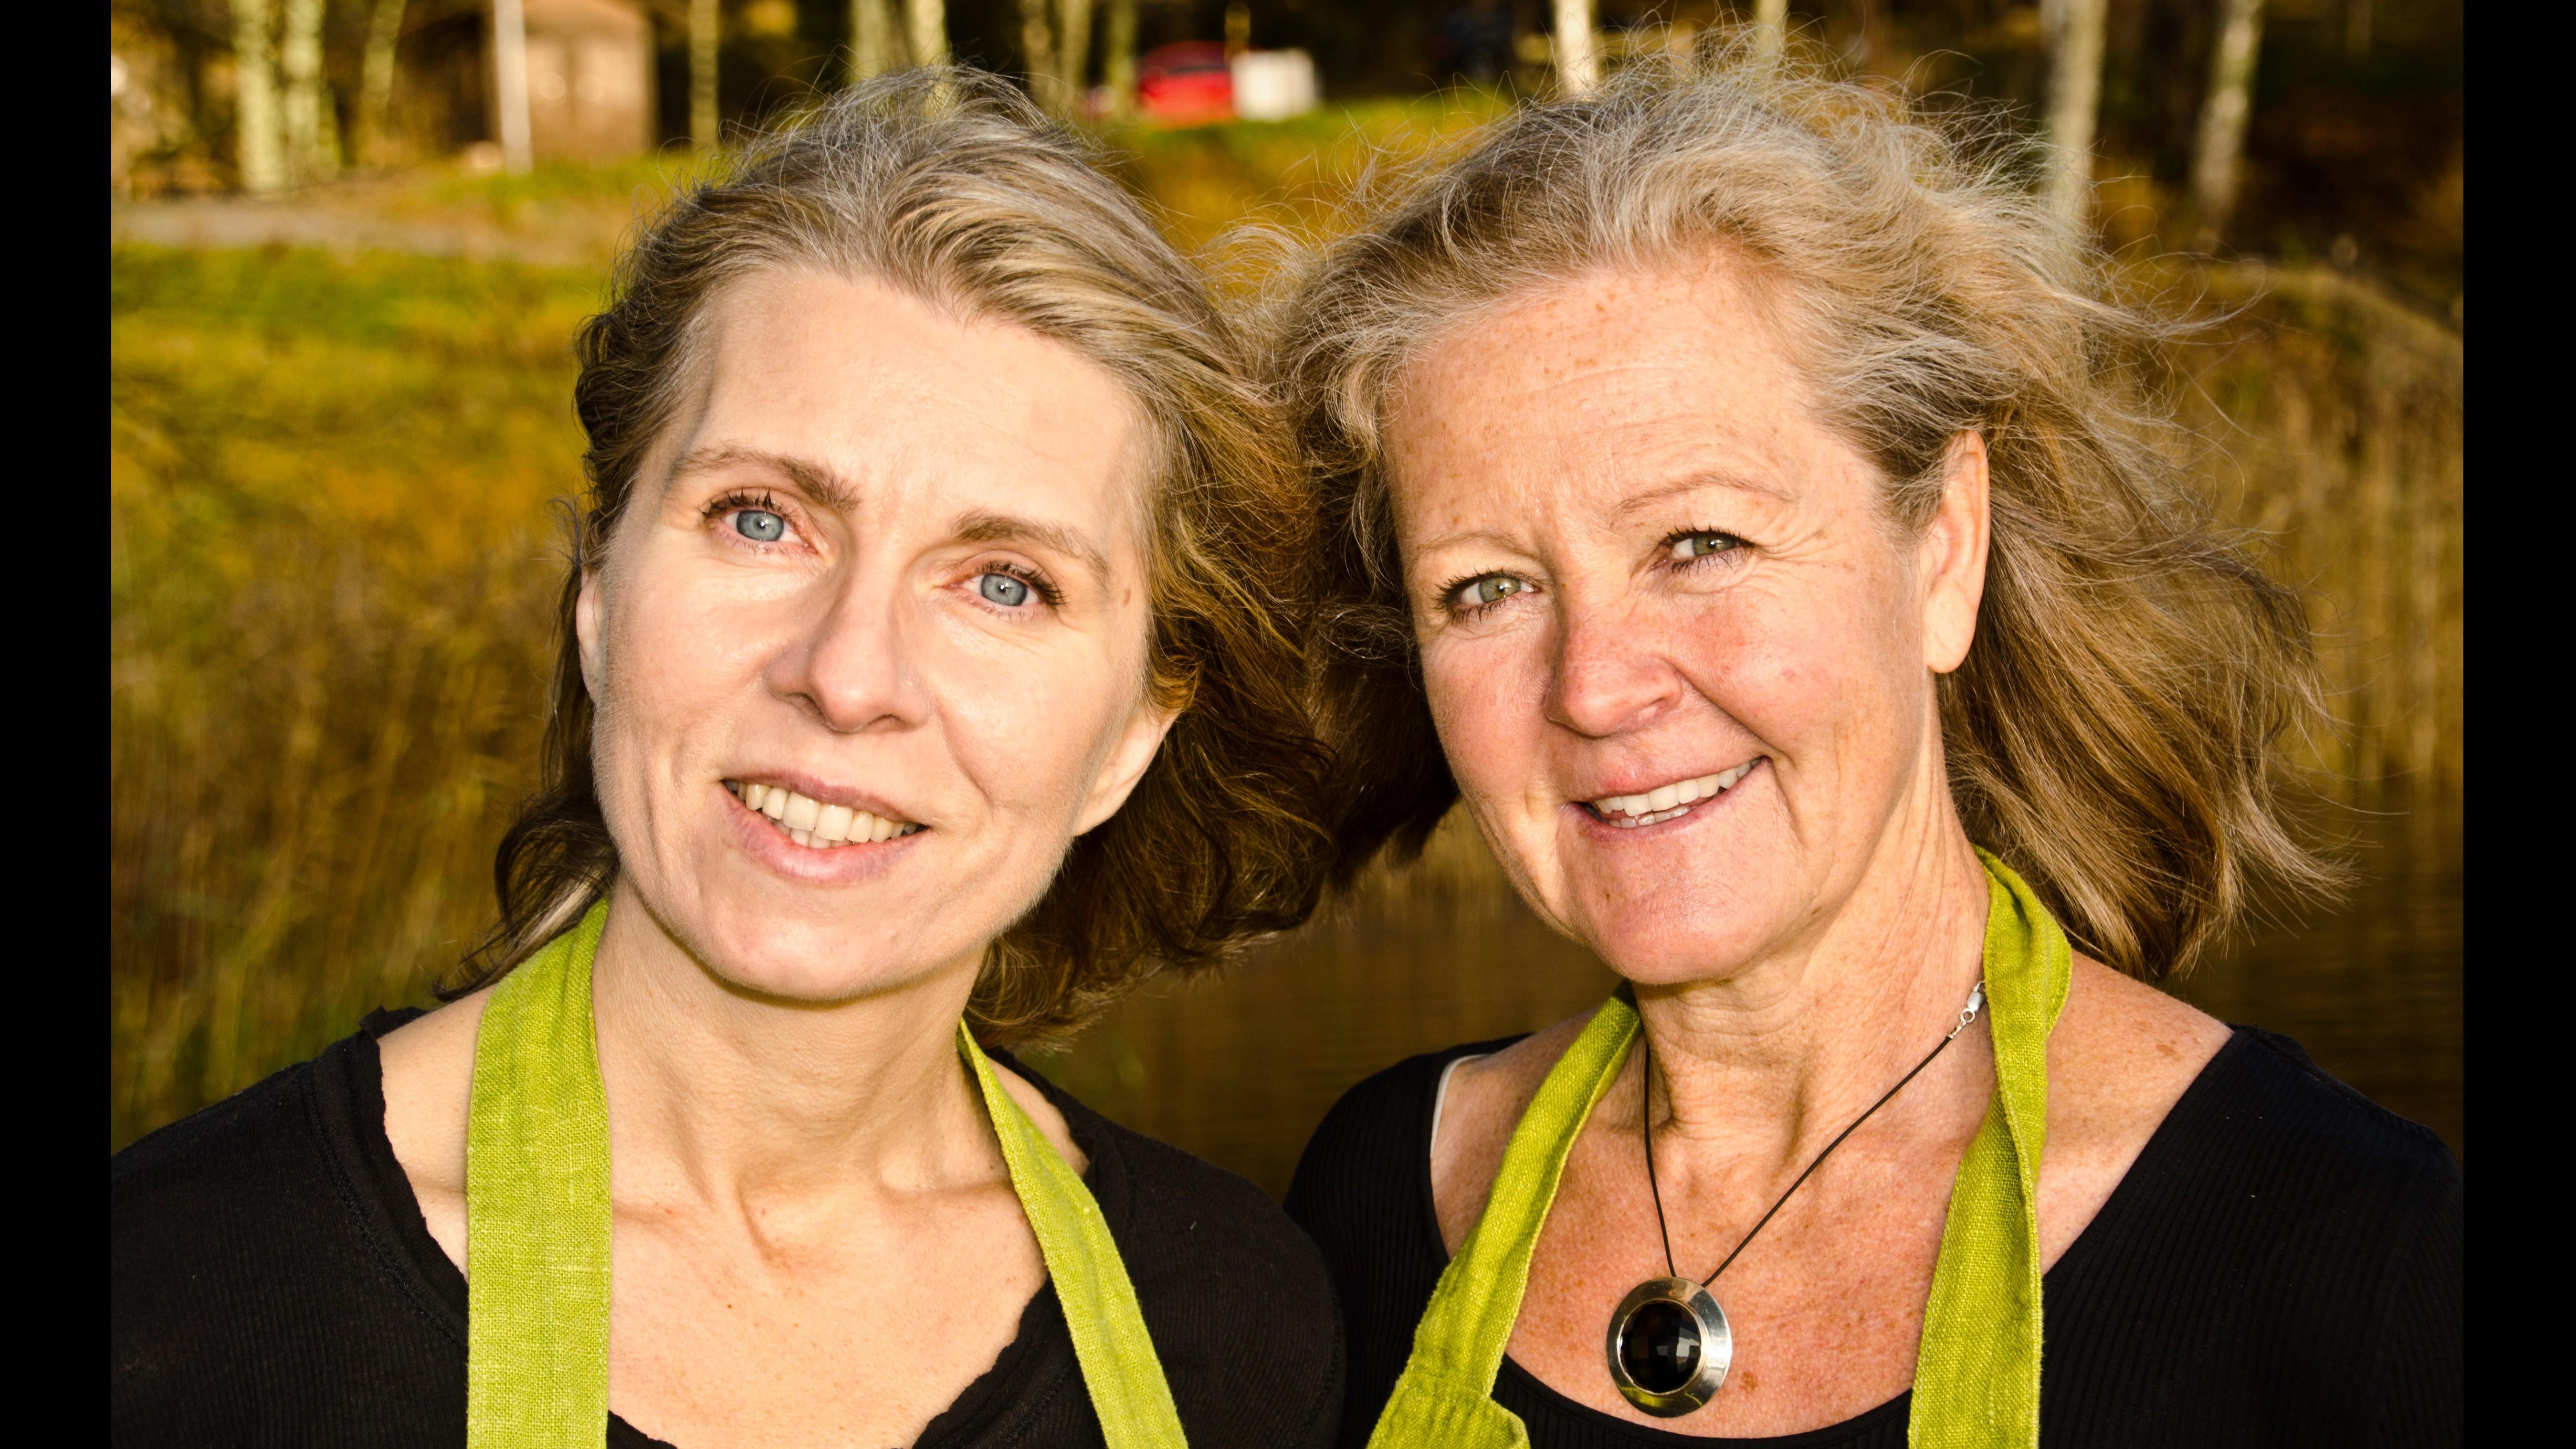 Anbud365: Svensk rapport Norge nordisk jumbo i økologiske anskaffelser